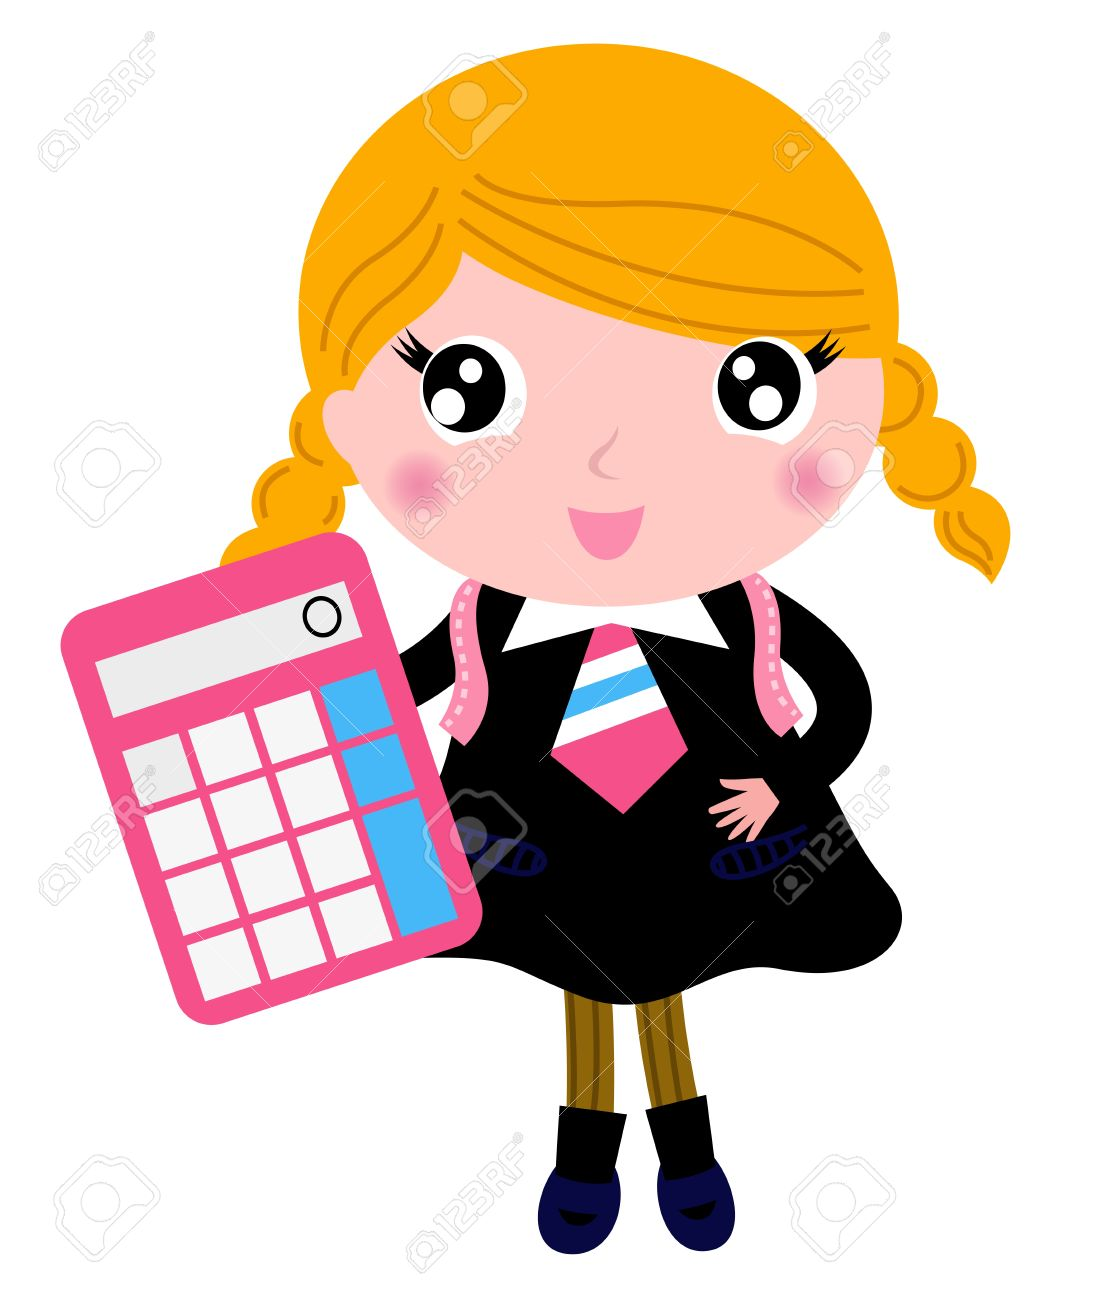 Cute Girl In School Uniform. Vector Cartoon Illustration Royalty ...